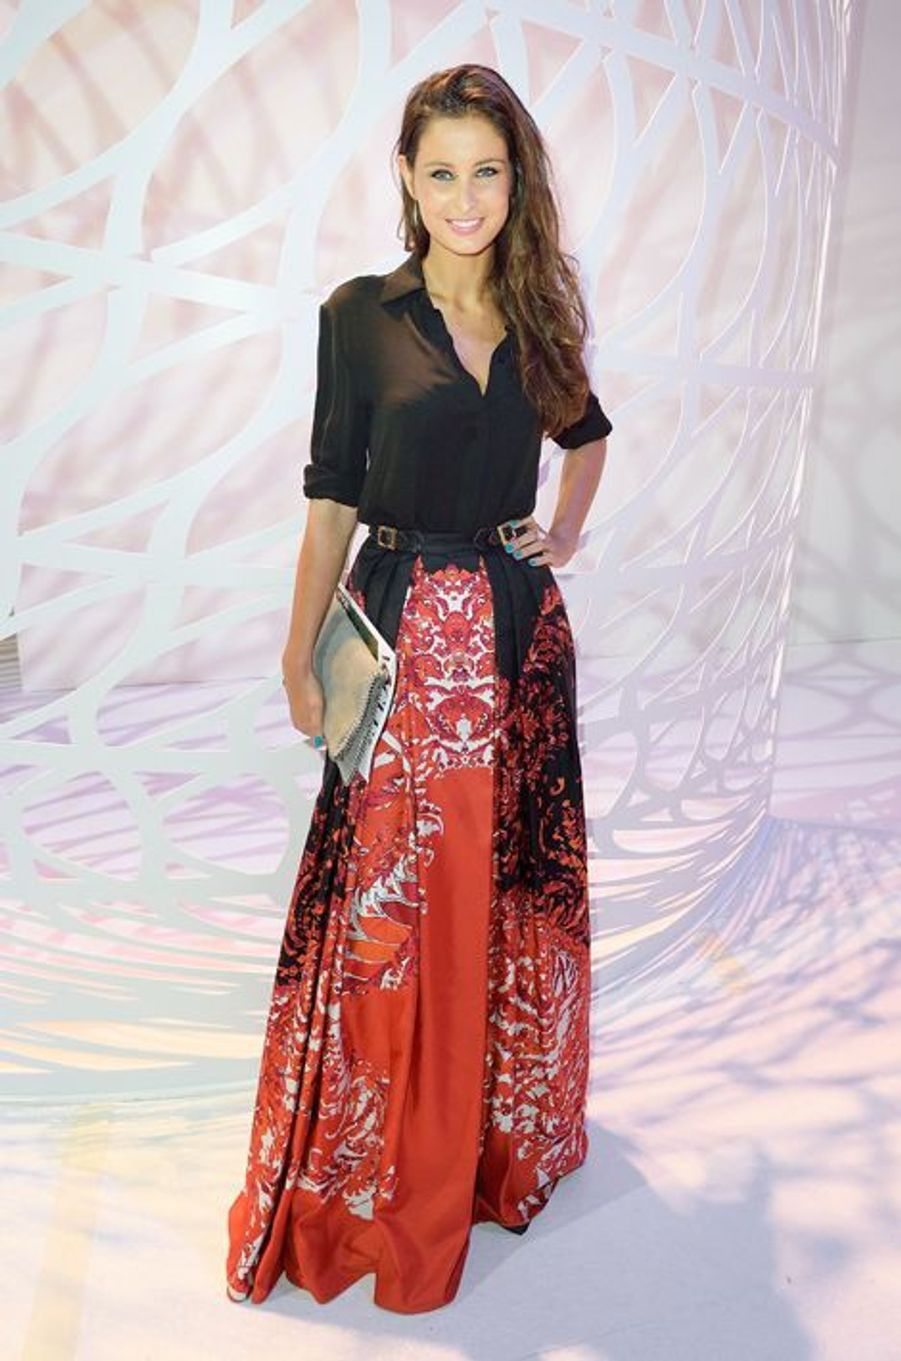 Malika Ménard au défilé Zuhair Murad à la Paris Fashion Week 2014.